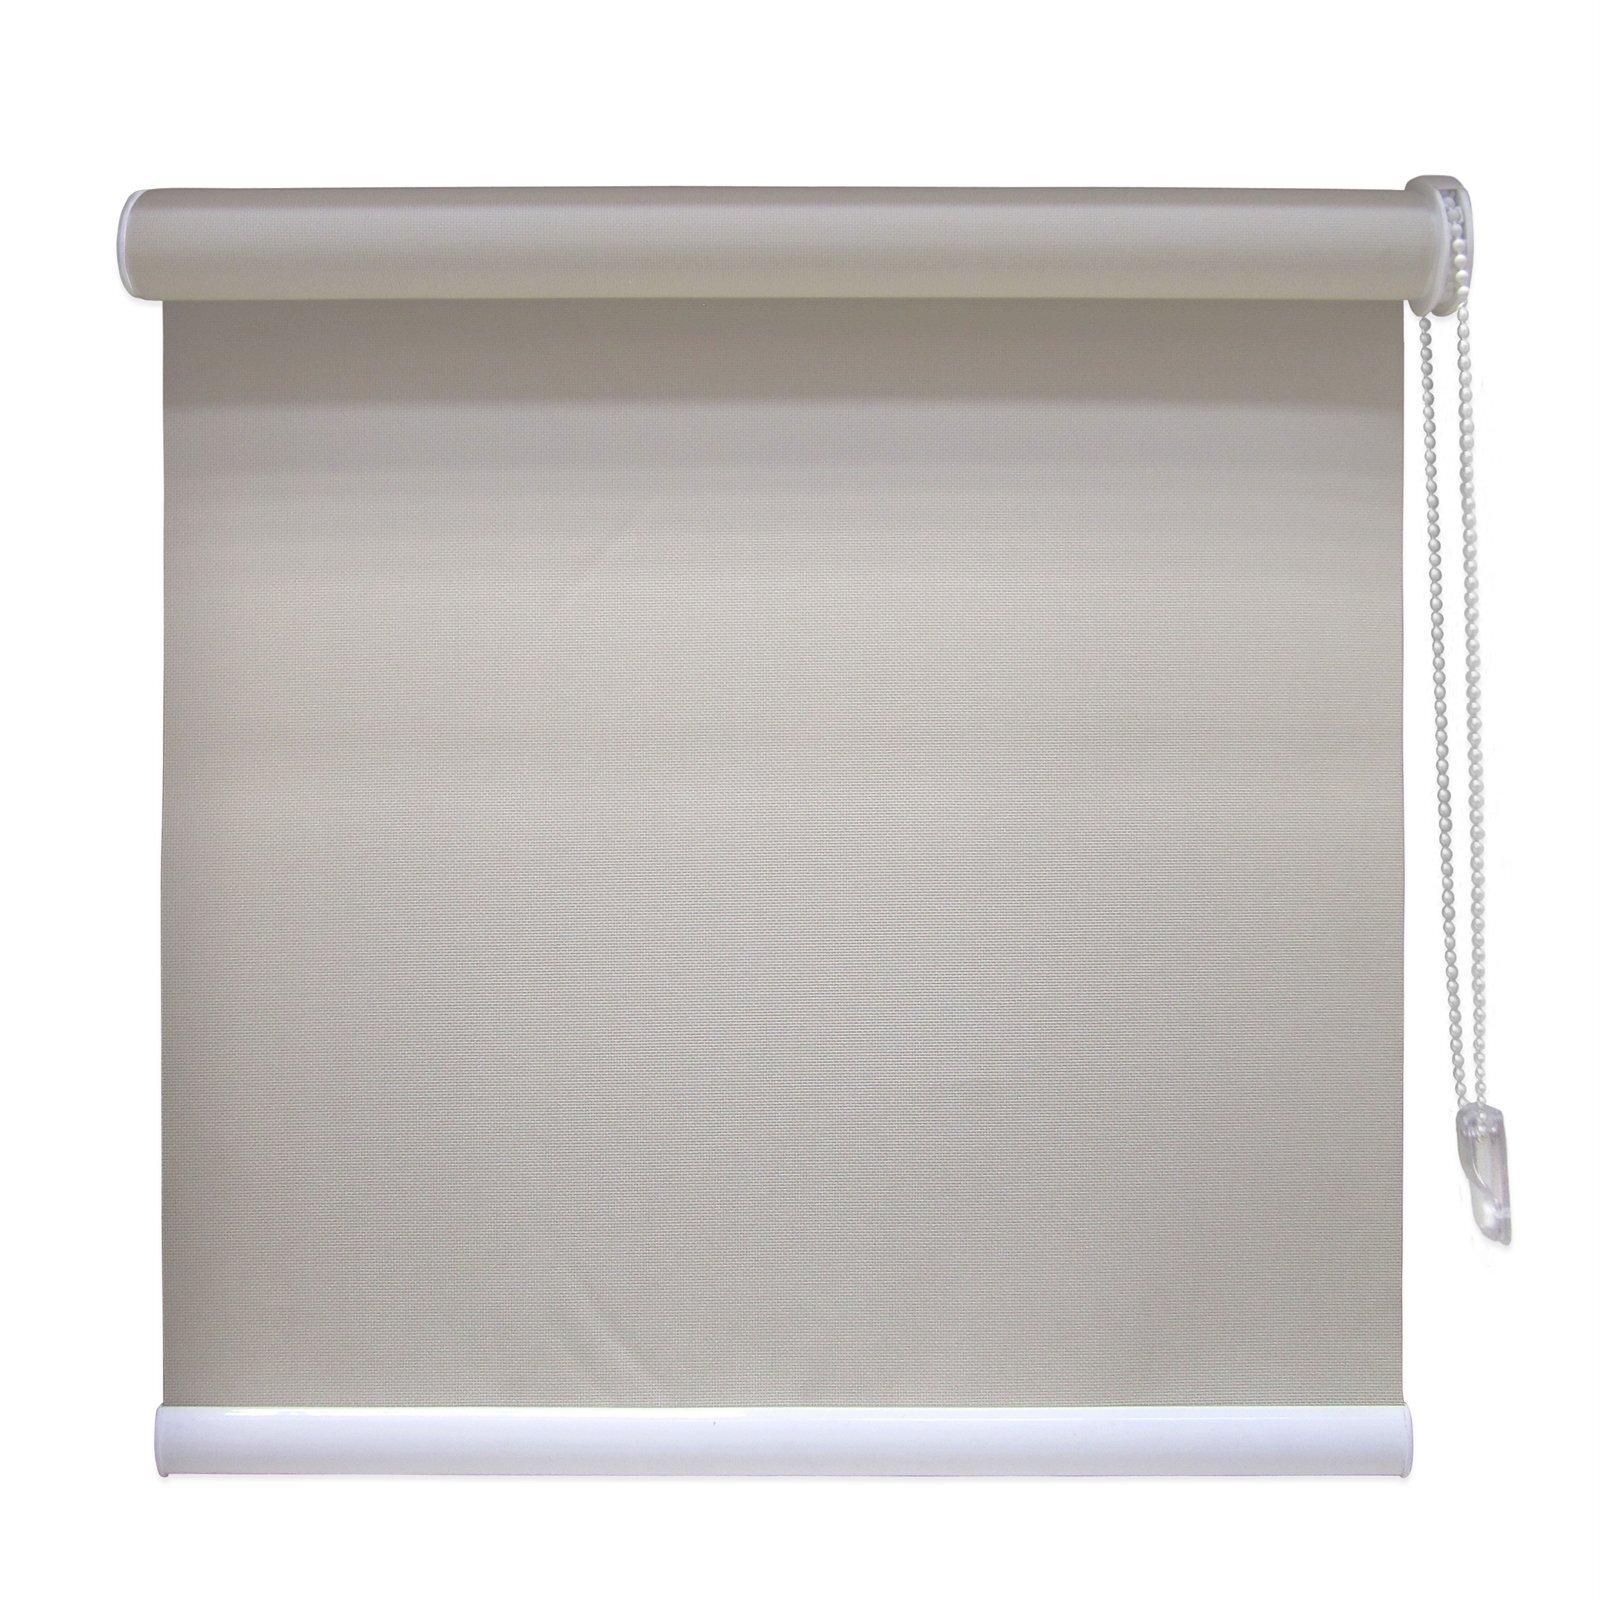 Riva 150 - 614 x 1315 - 1614mm SolarFilter 97 Sunscreen Roller Blind